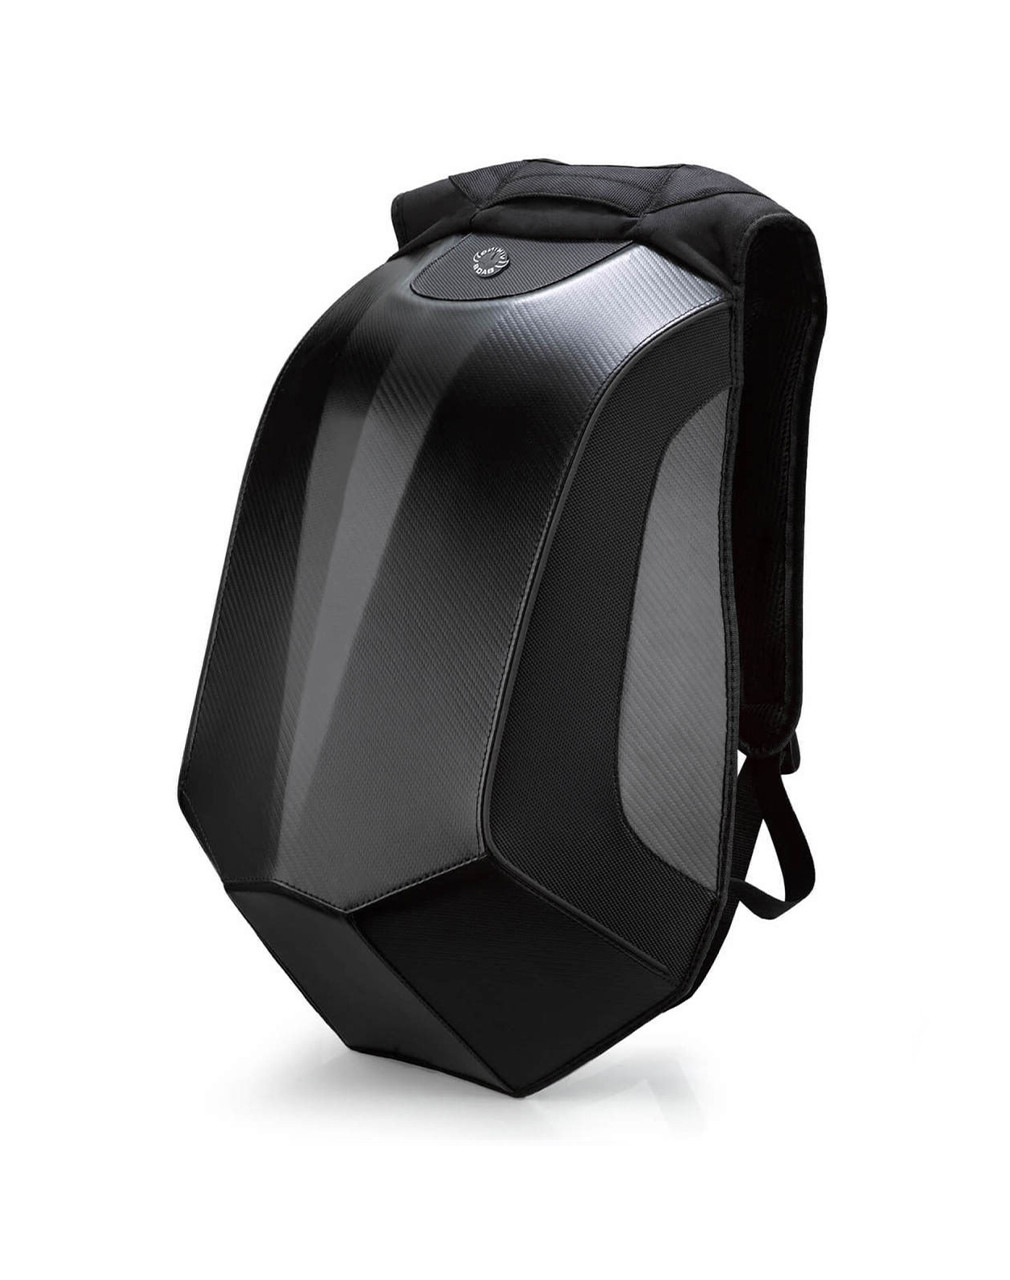 VikingBags Velocity Large Black Expandable Yamaha Motorcycle Backpack Main Bag View